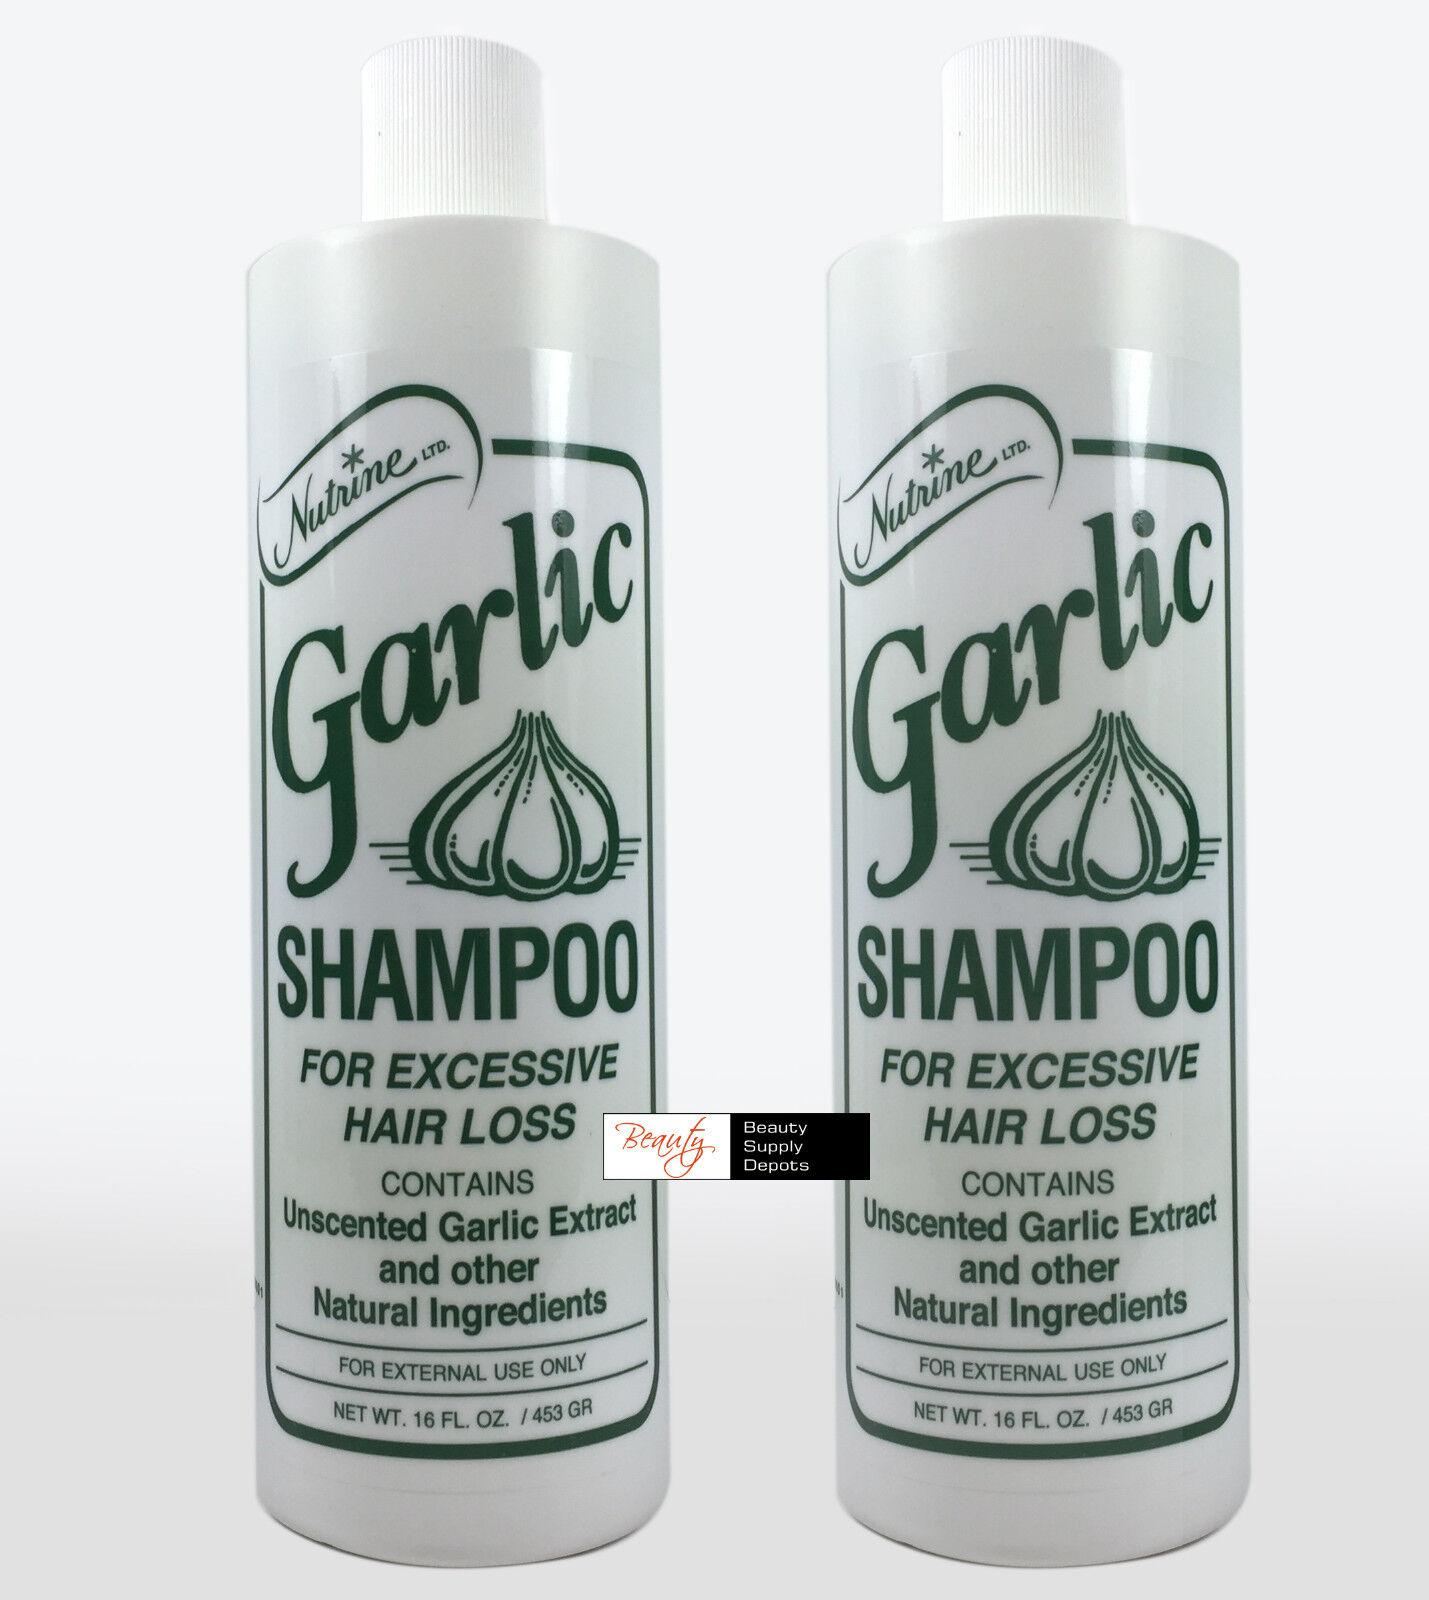 Nutrine Garlic Shampoo for Excessive Hair Loss Unscented 16o